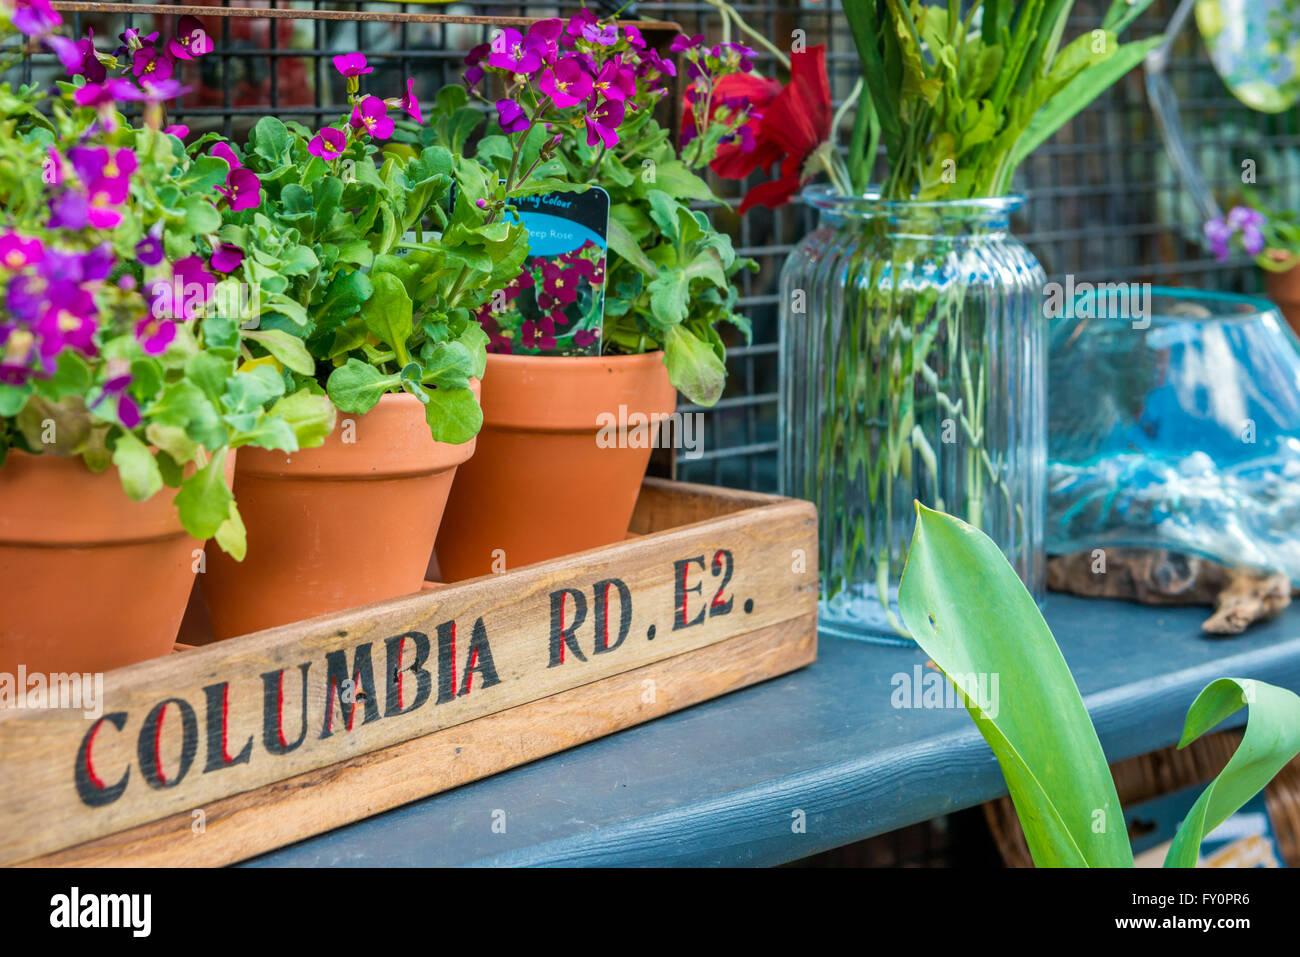 London, United Kingdom - April 17, 2016: Columbia Road Flower Sunday market. Shop windows display - Stock Image